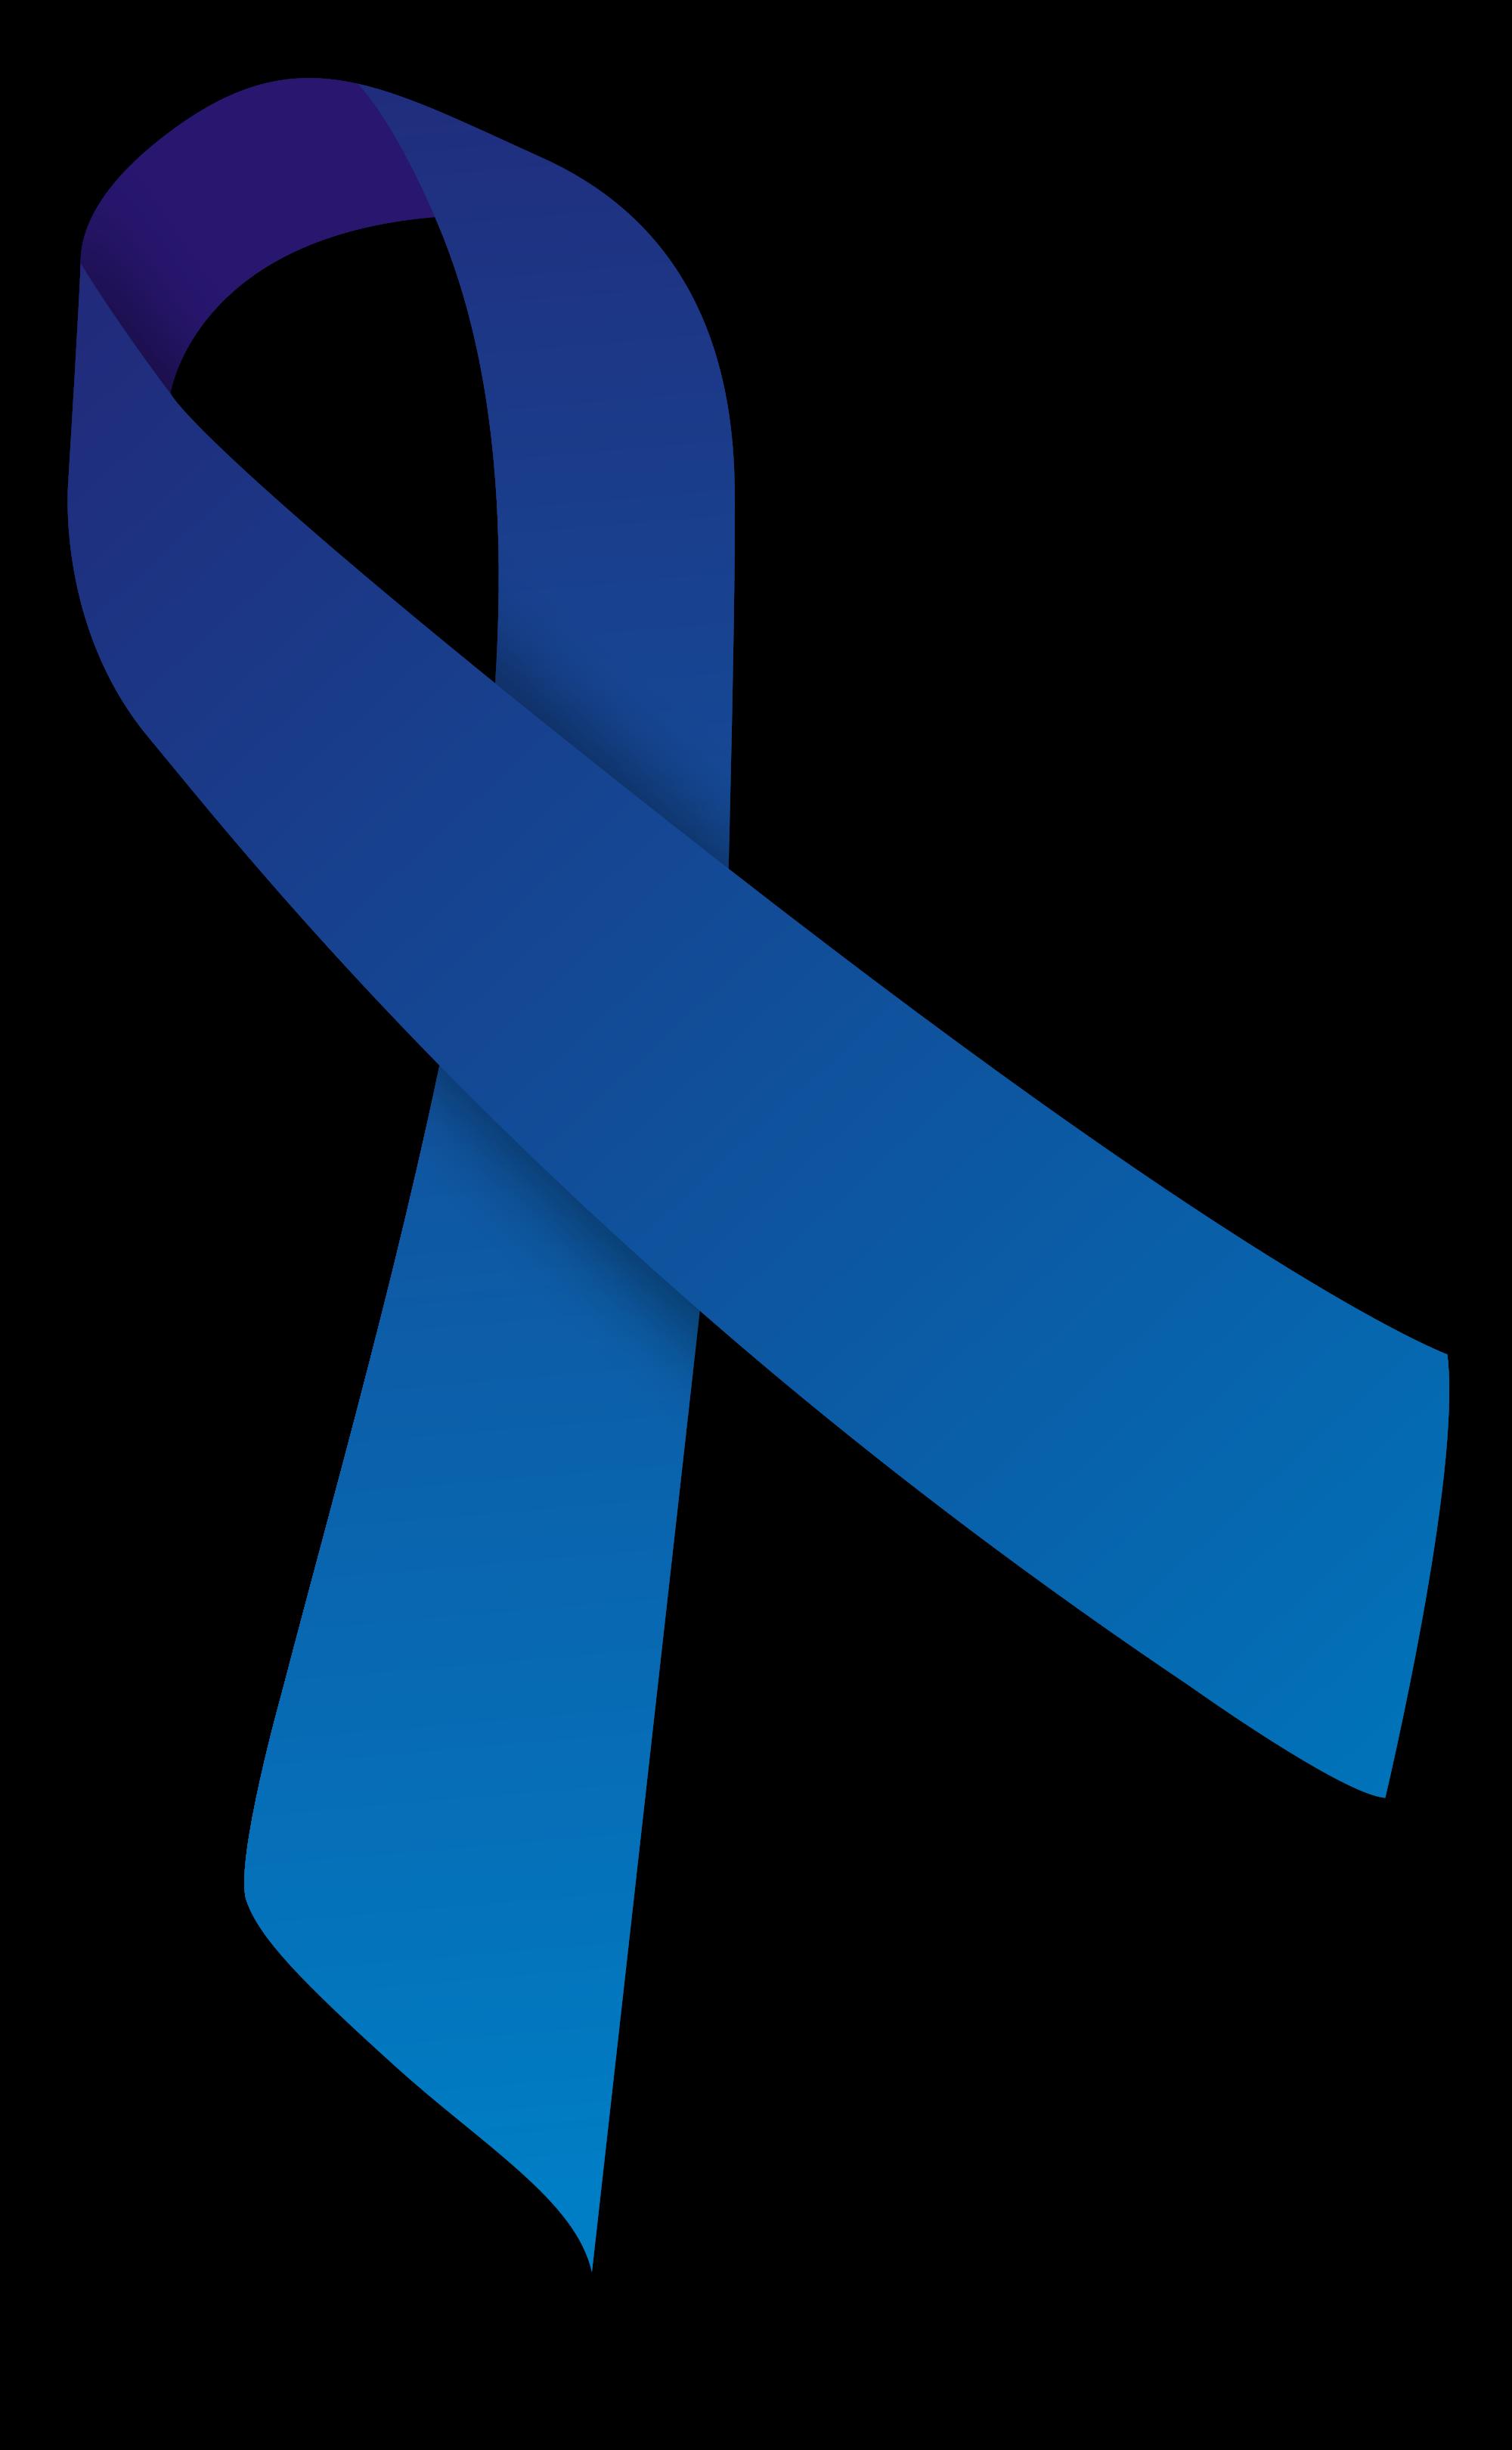 colon cancer ribbon clip art www imgkid com the image colorectal cancer ribbon clip art Angel with Colon Cancer Ribbon